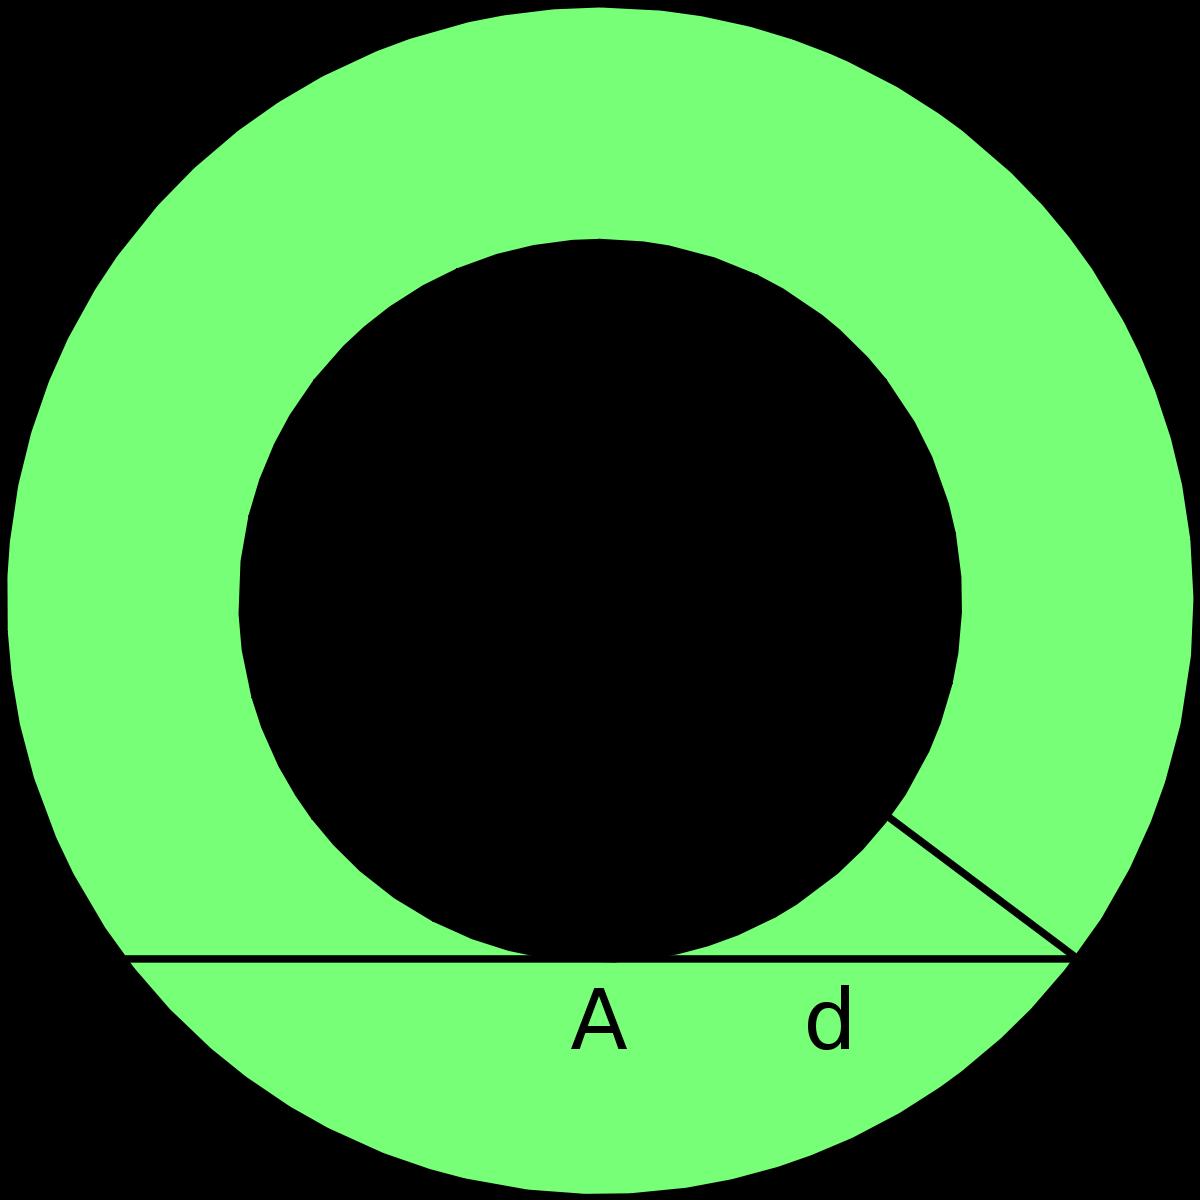 Geometry clipart plane figure. Annulus mathematics wikipedia